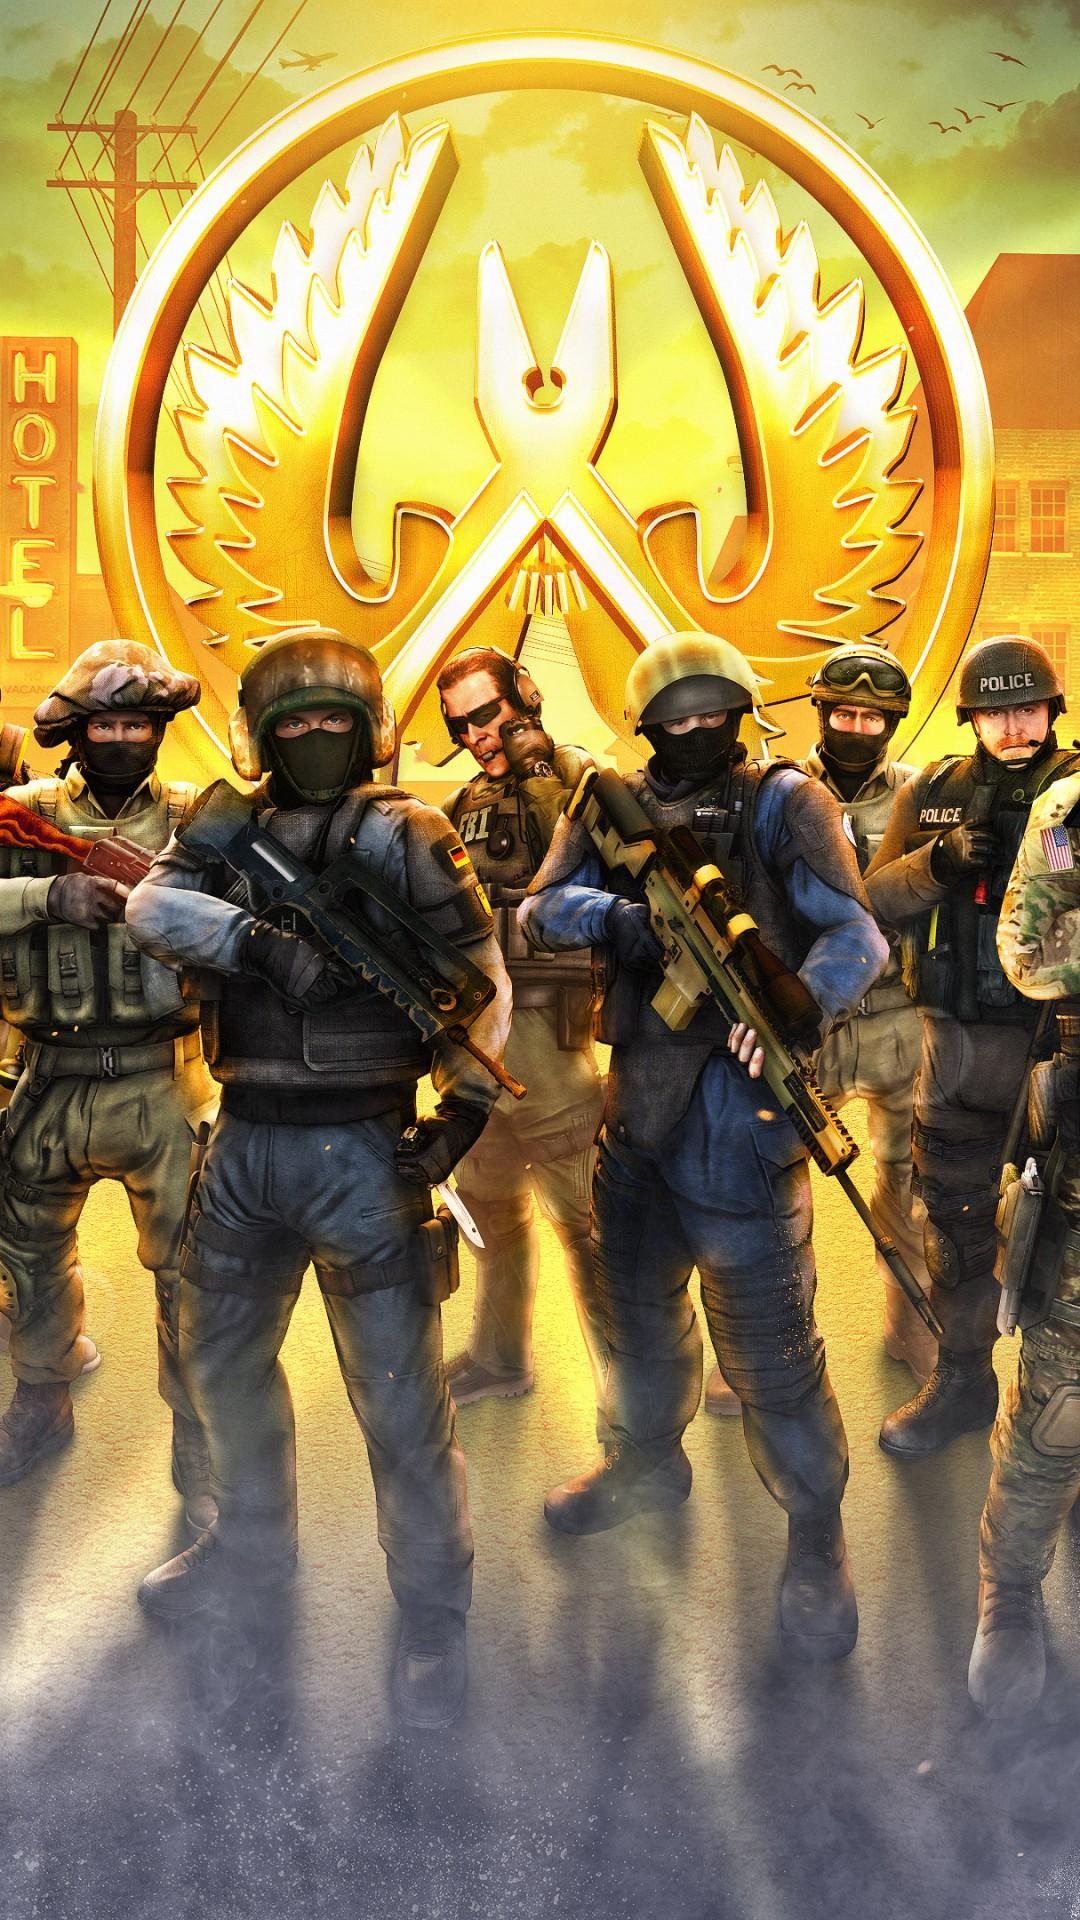 Wallpaper Counter Strike Global Offensive 4k Poster